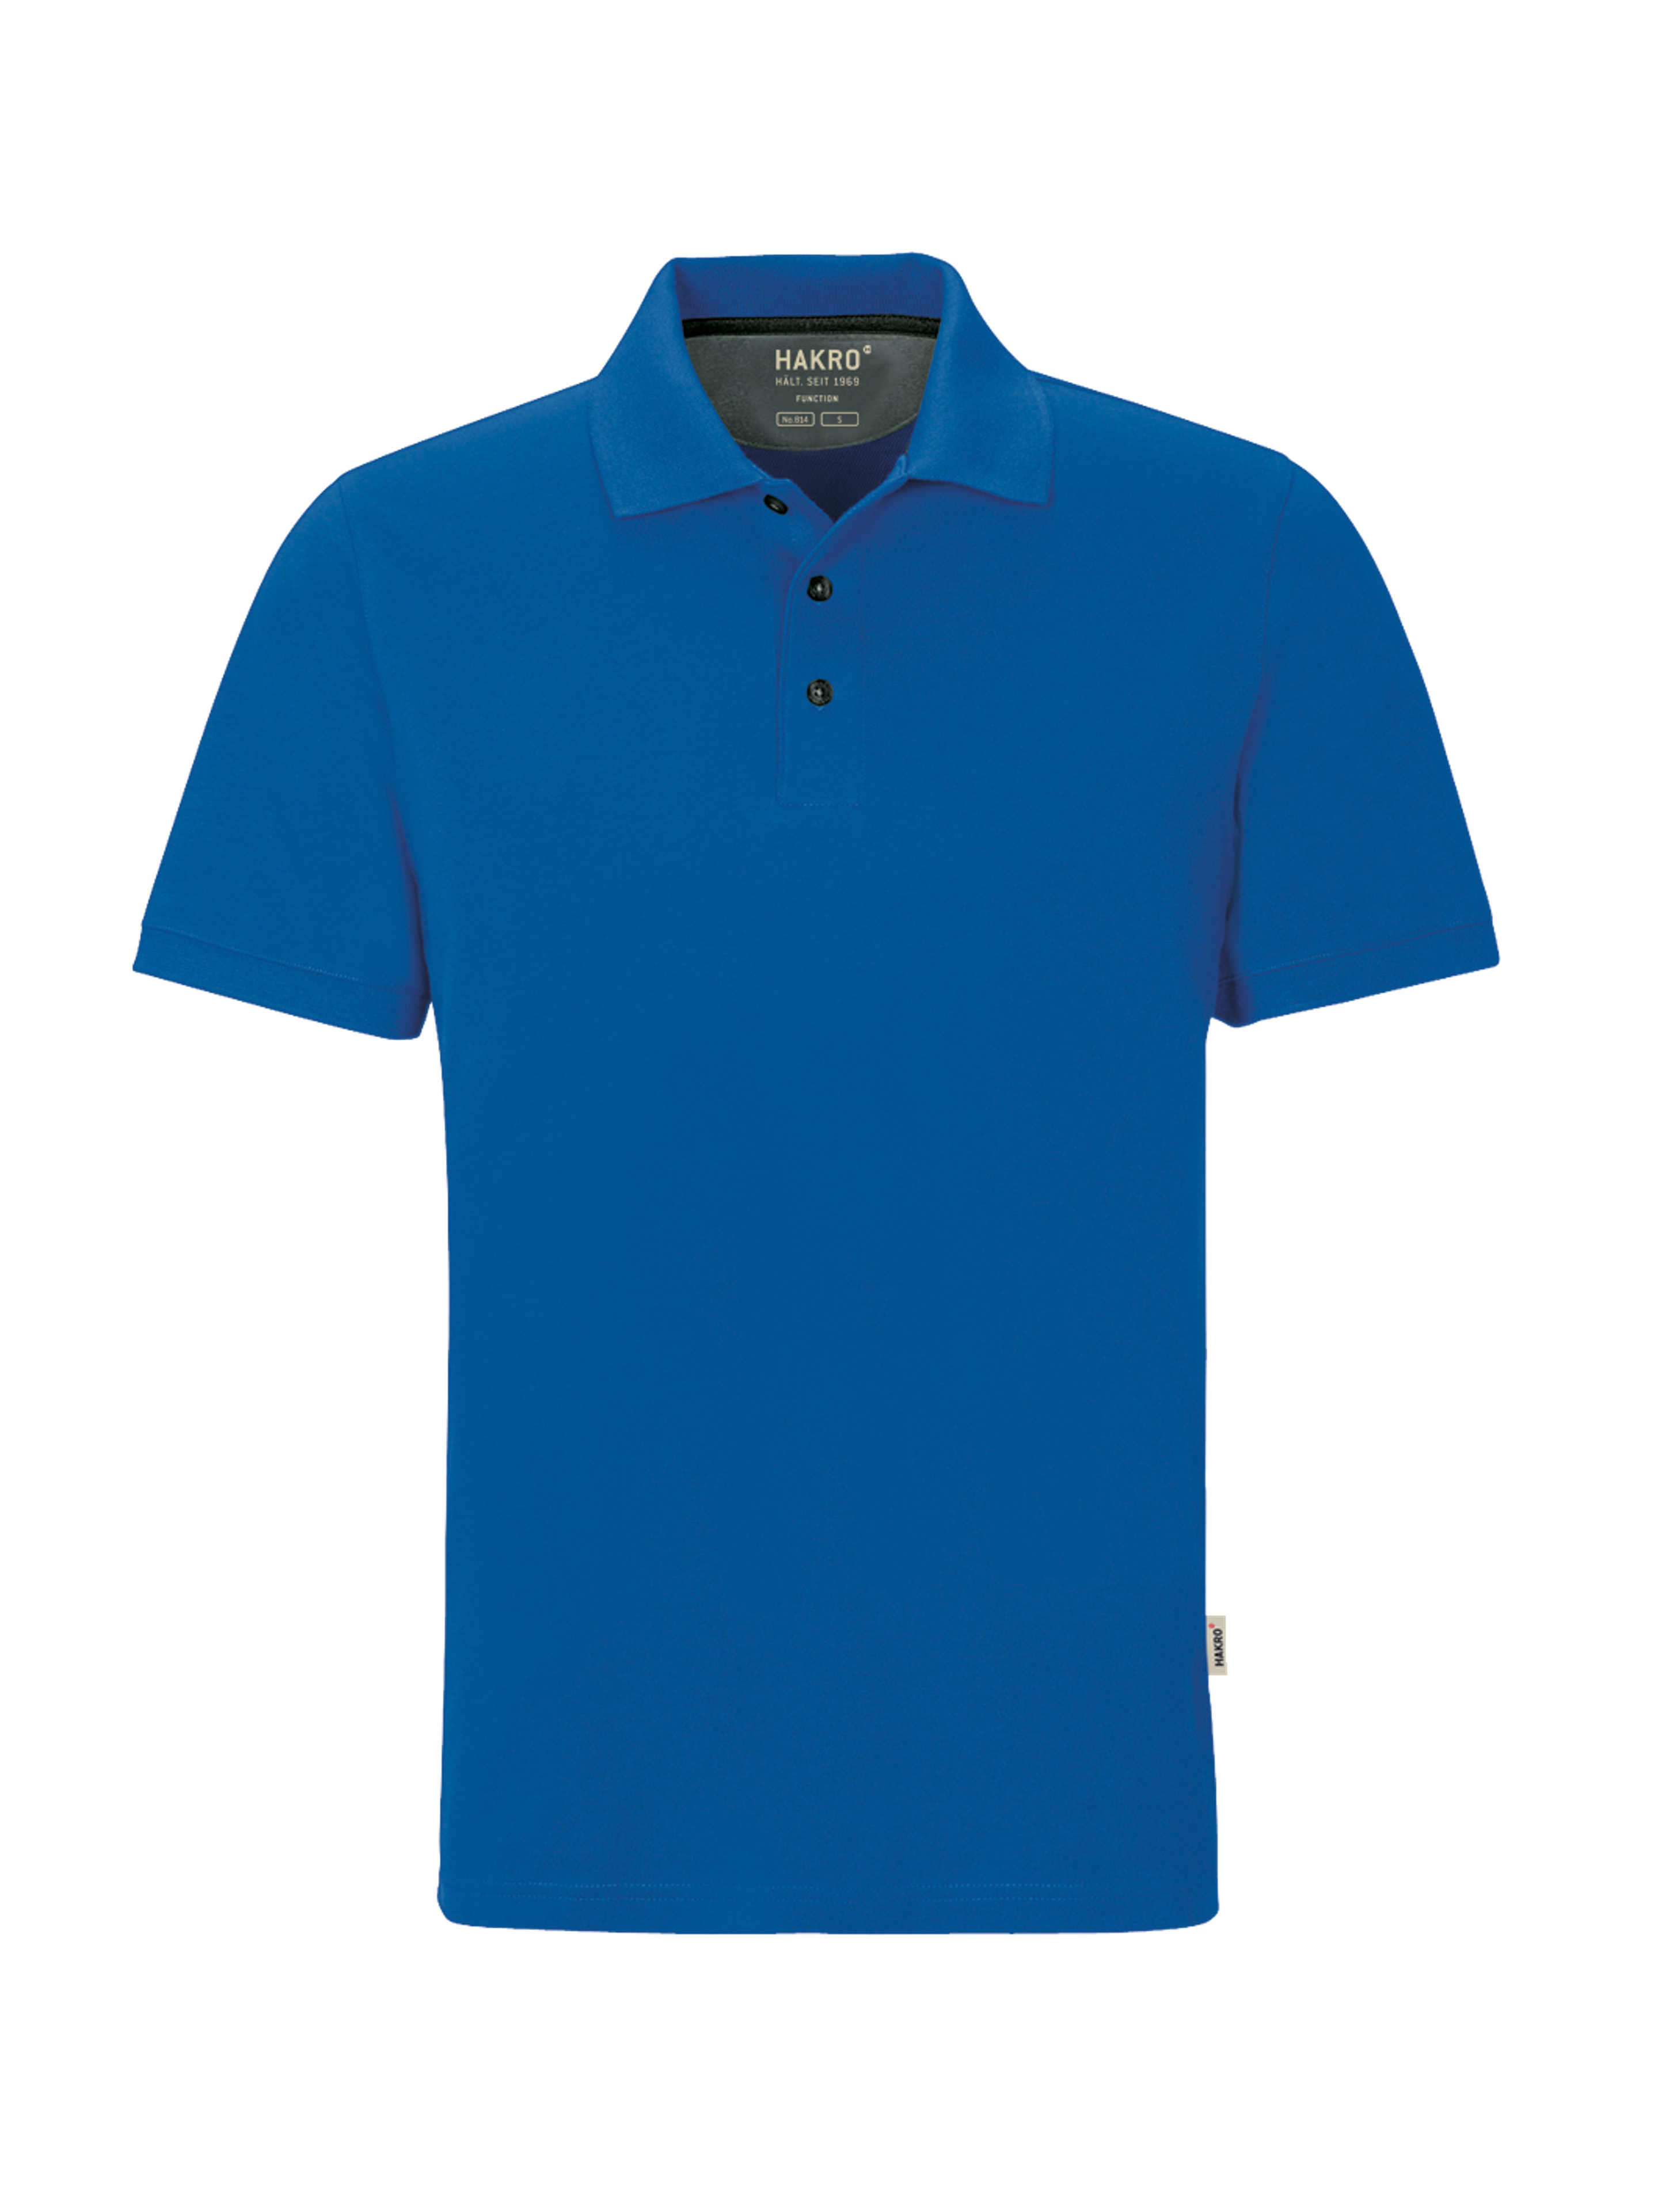 Poloshirt Cotton-Tec 814